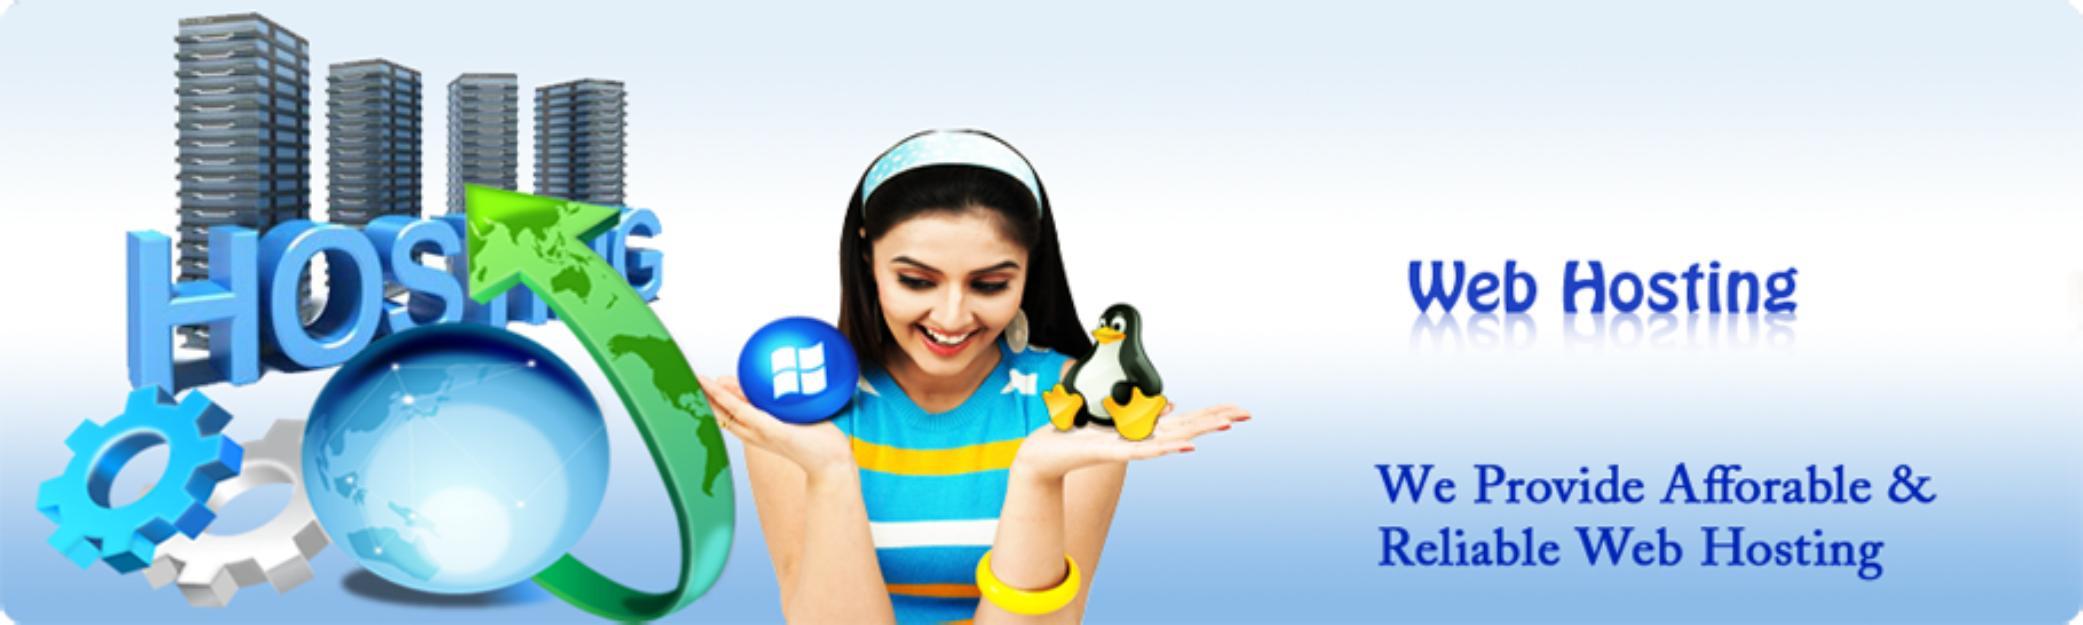 Website Hosting Services,Professional Web Hosting company in dhaka,Best Web Hosting company in bangladesh